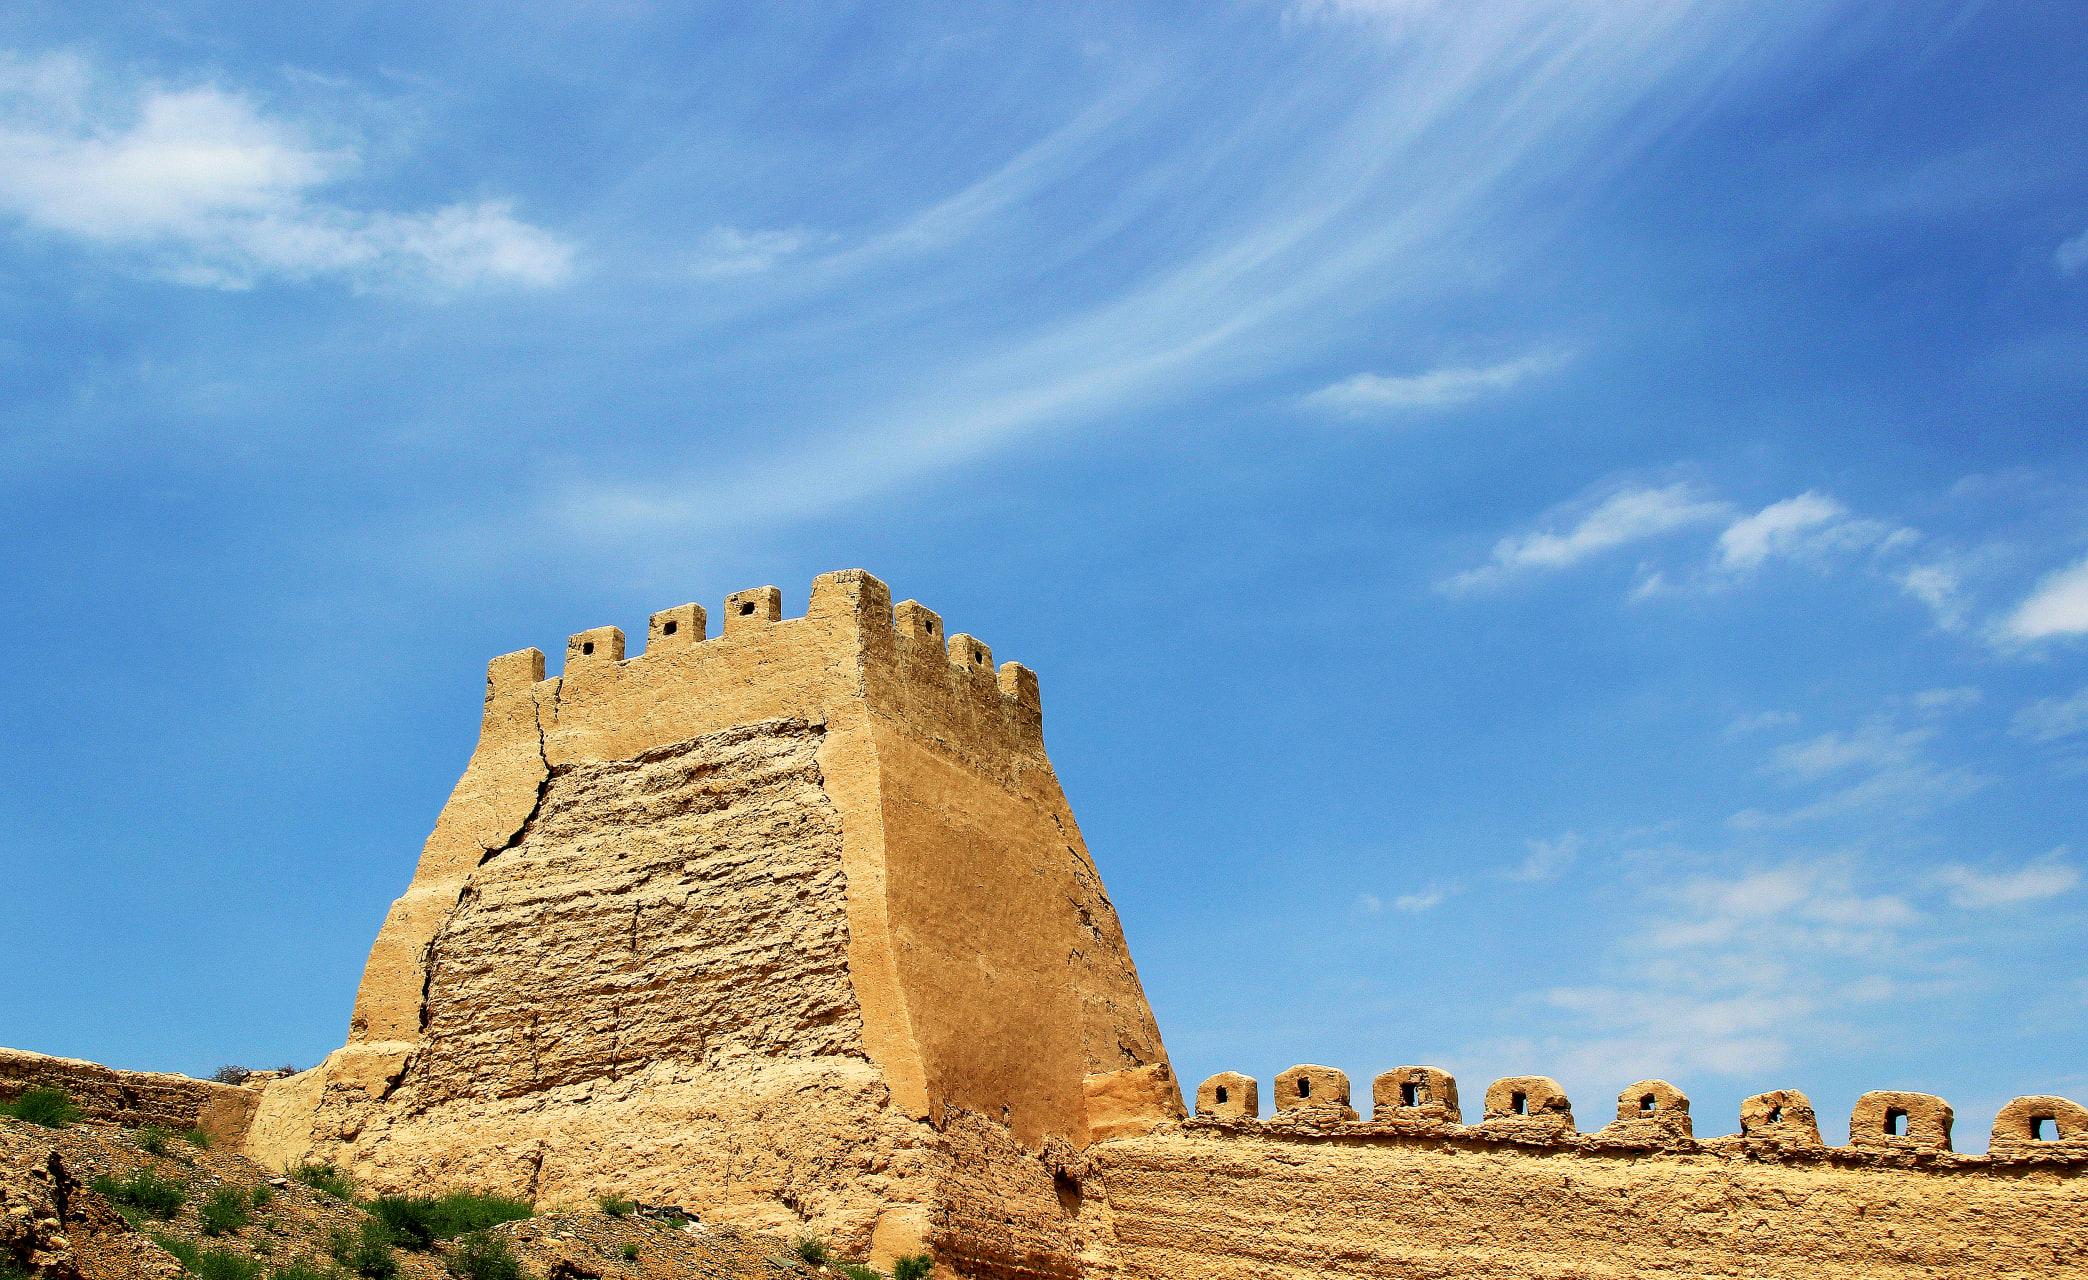 Hexi Corridor (China's Silk Road) - Jiayuguan Cantilever Great Wall:  A Unique Element of Ancient Silk Road